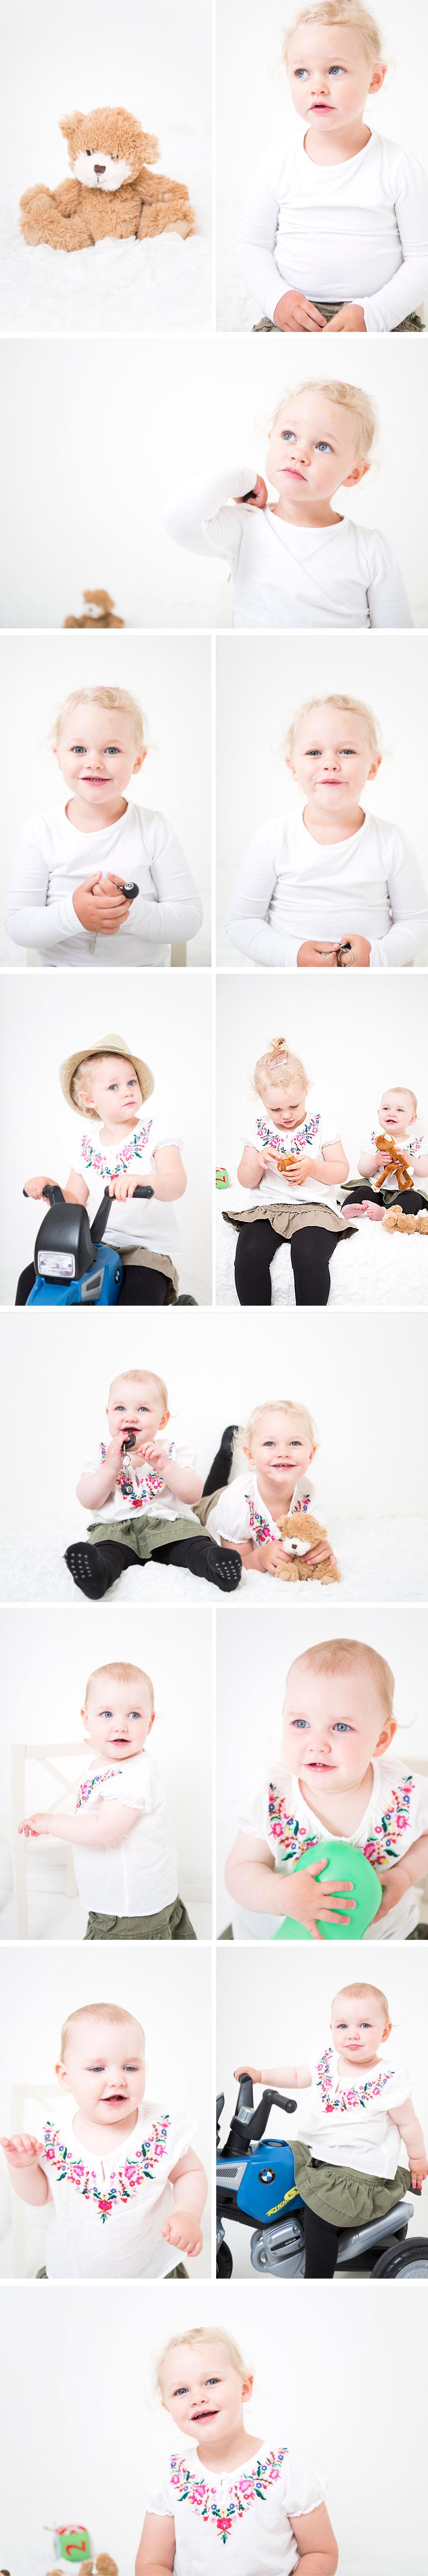 Therese Stenvall, barnfotografering Kungsbacka, familj foto, familjefotografering, Fotograf Therese Stenvall Blick foto,